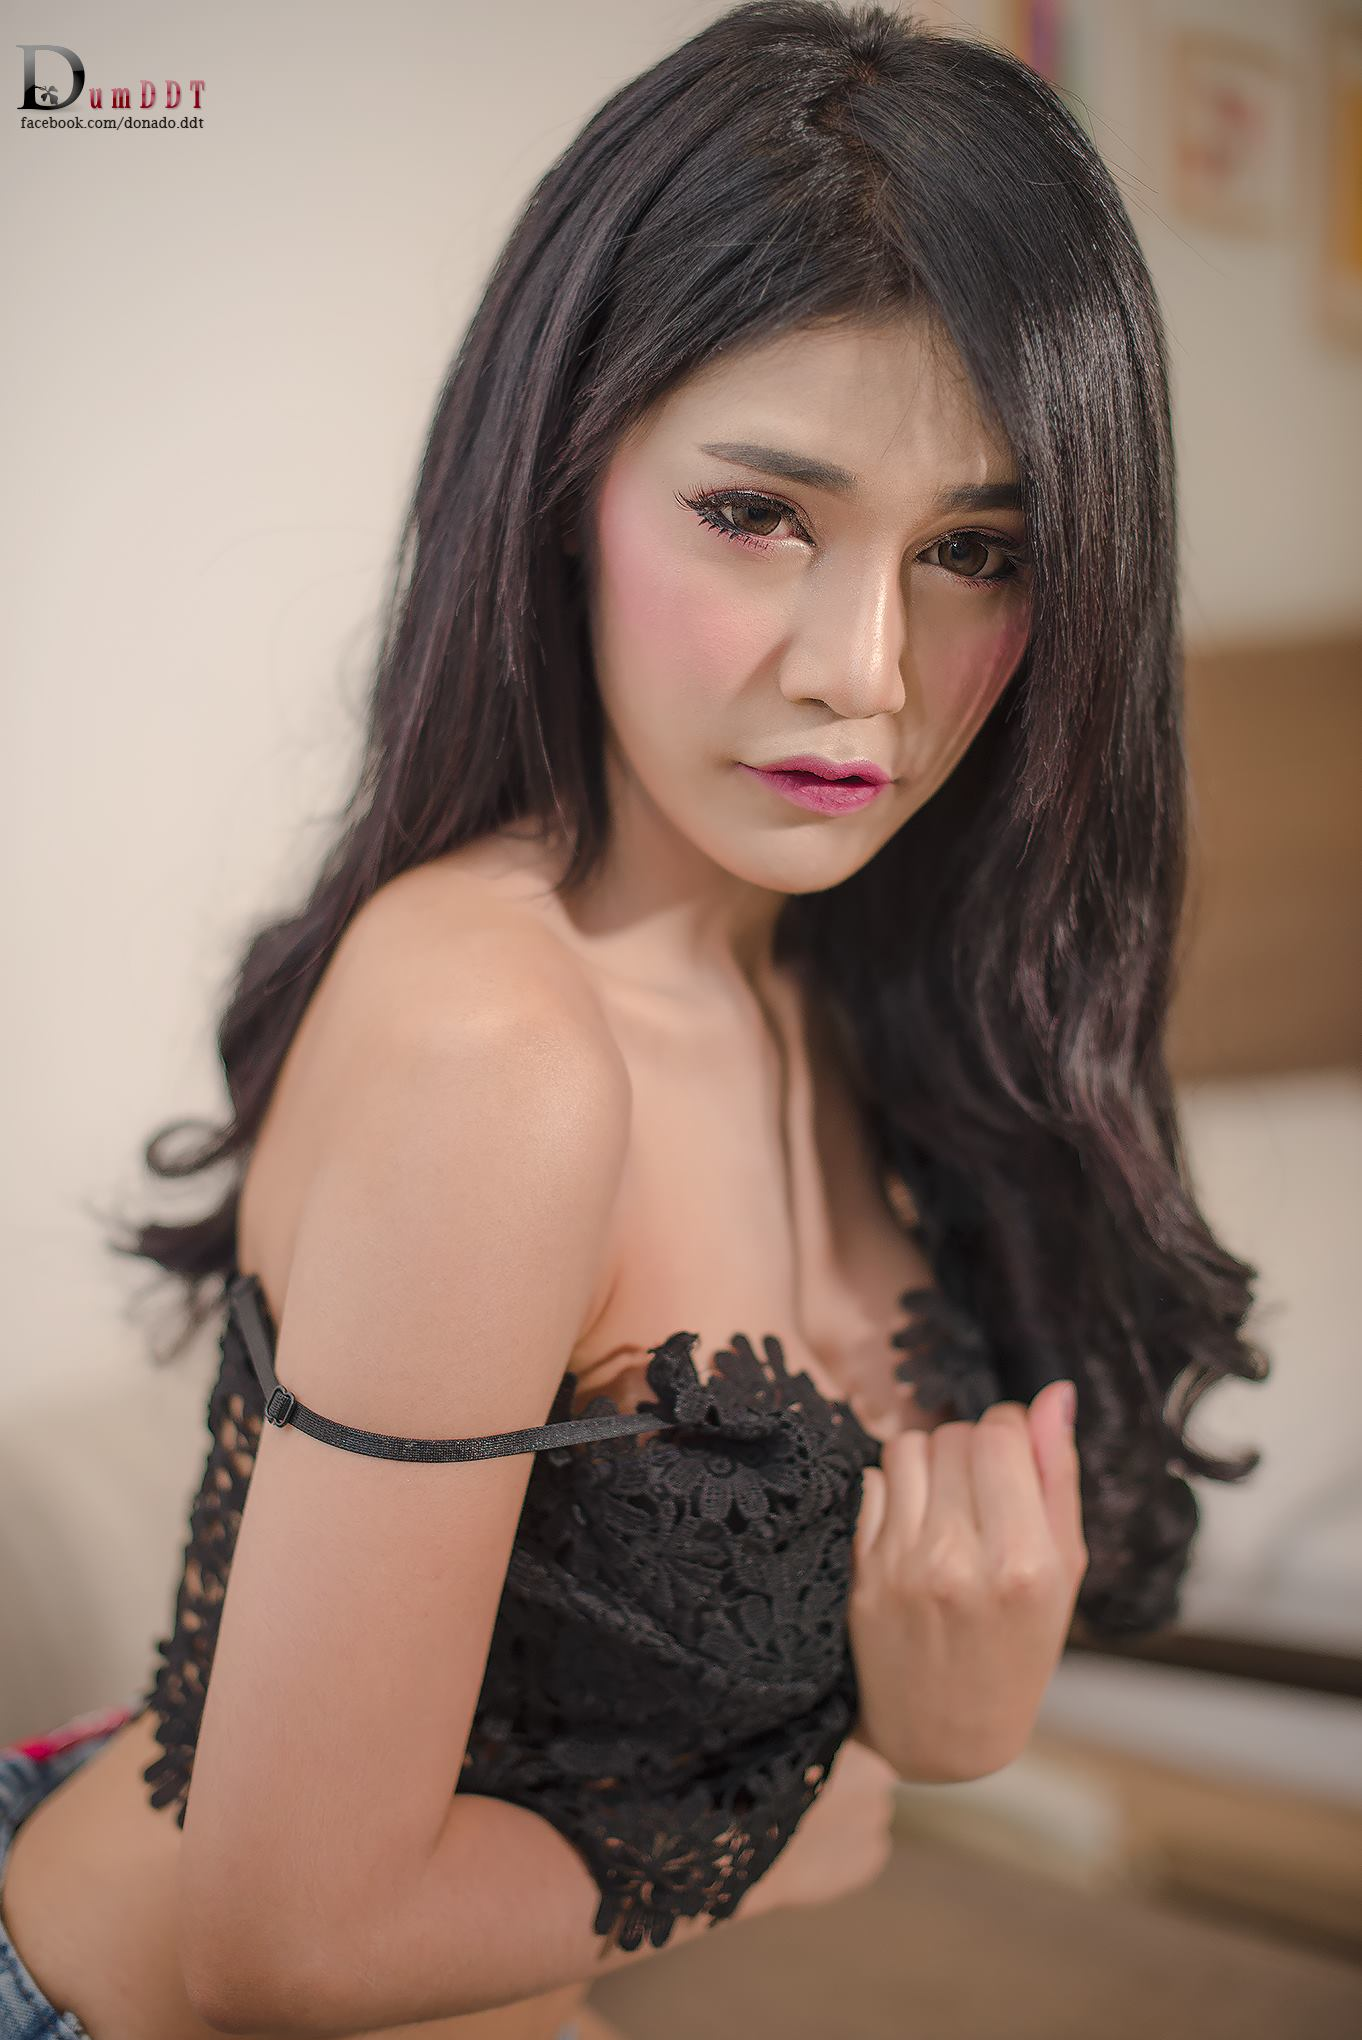 Pocky - Paweena Suwansatidsakron